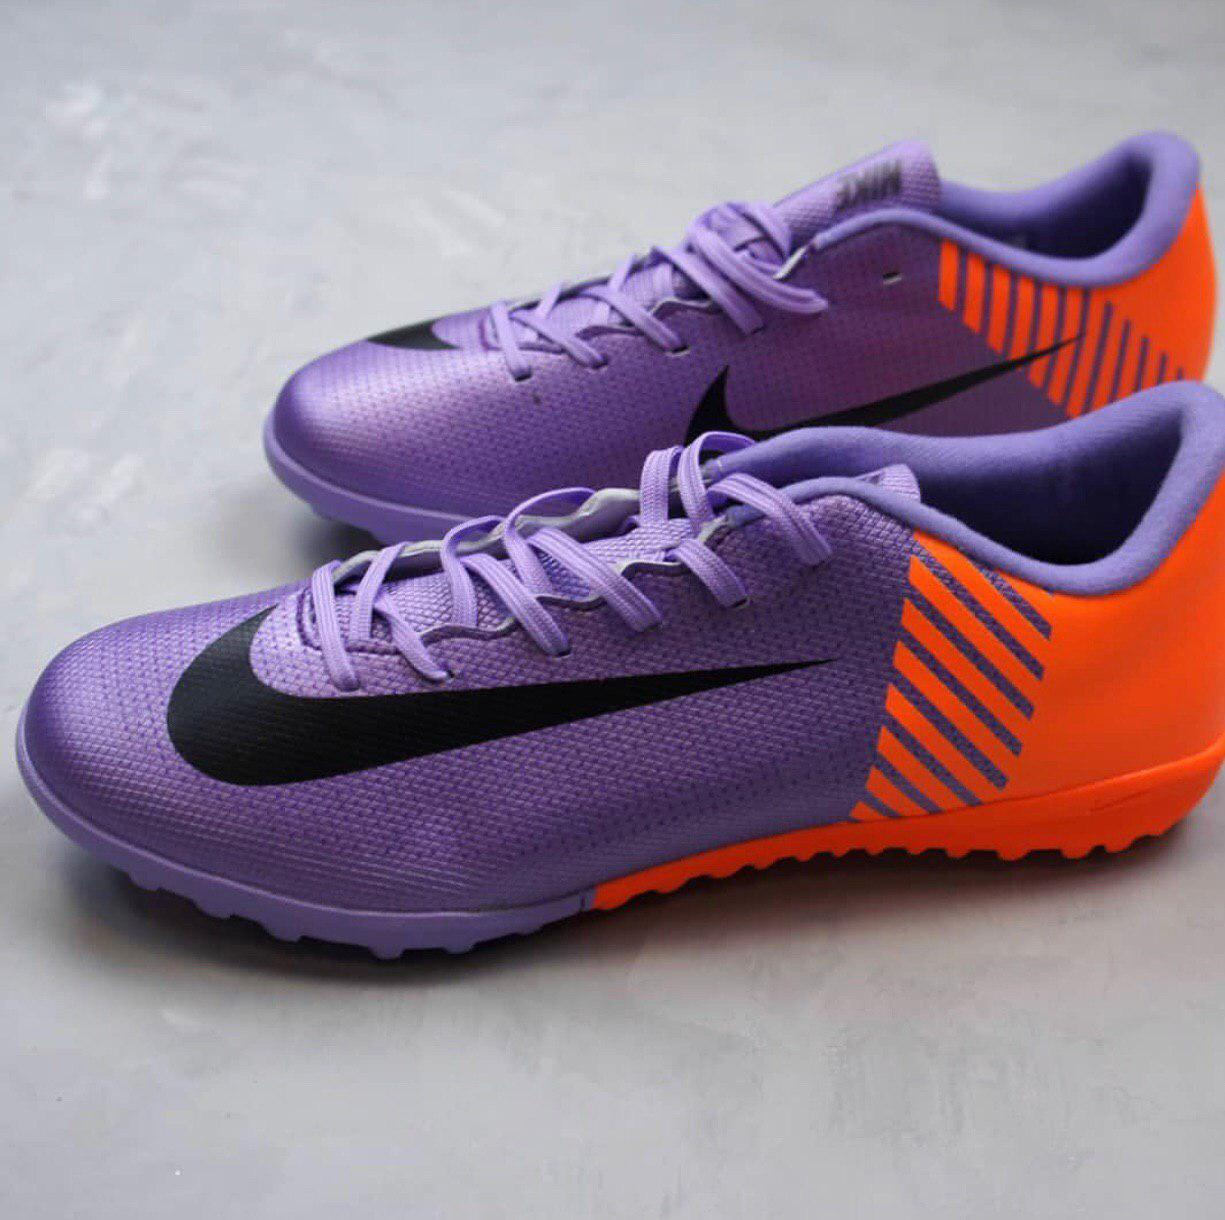 7a9cb012 Сороконожки Nike Mercurial Vapor XII TF , цена 1 129 грн., купить в ...